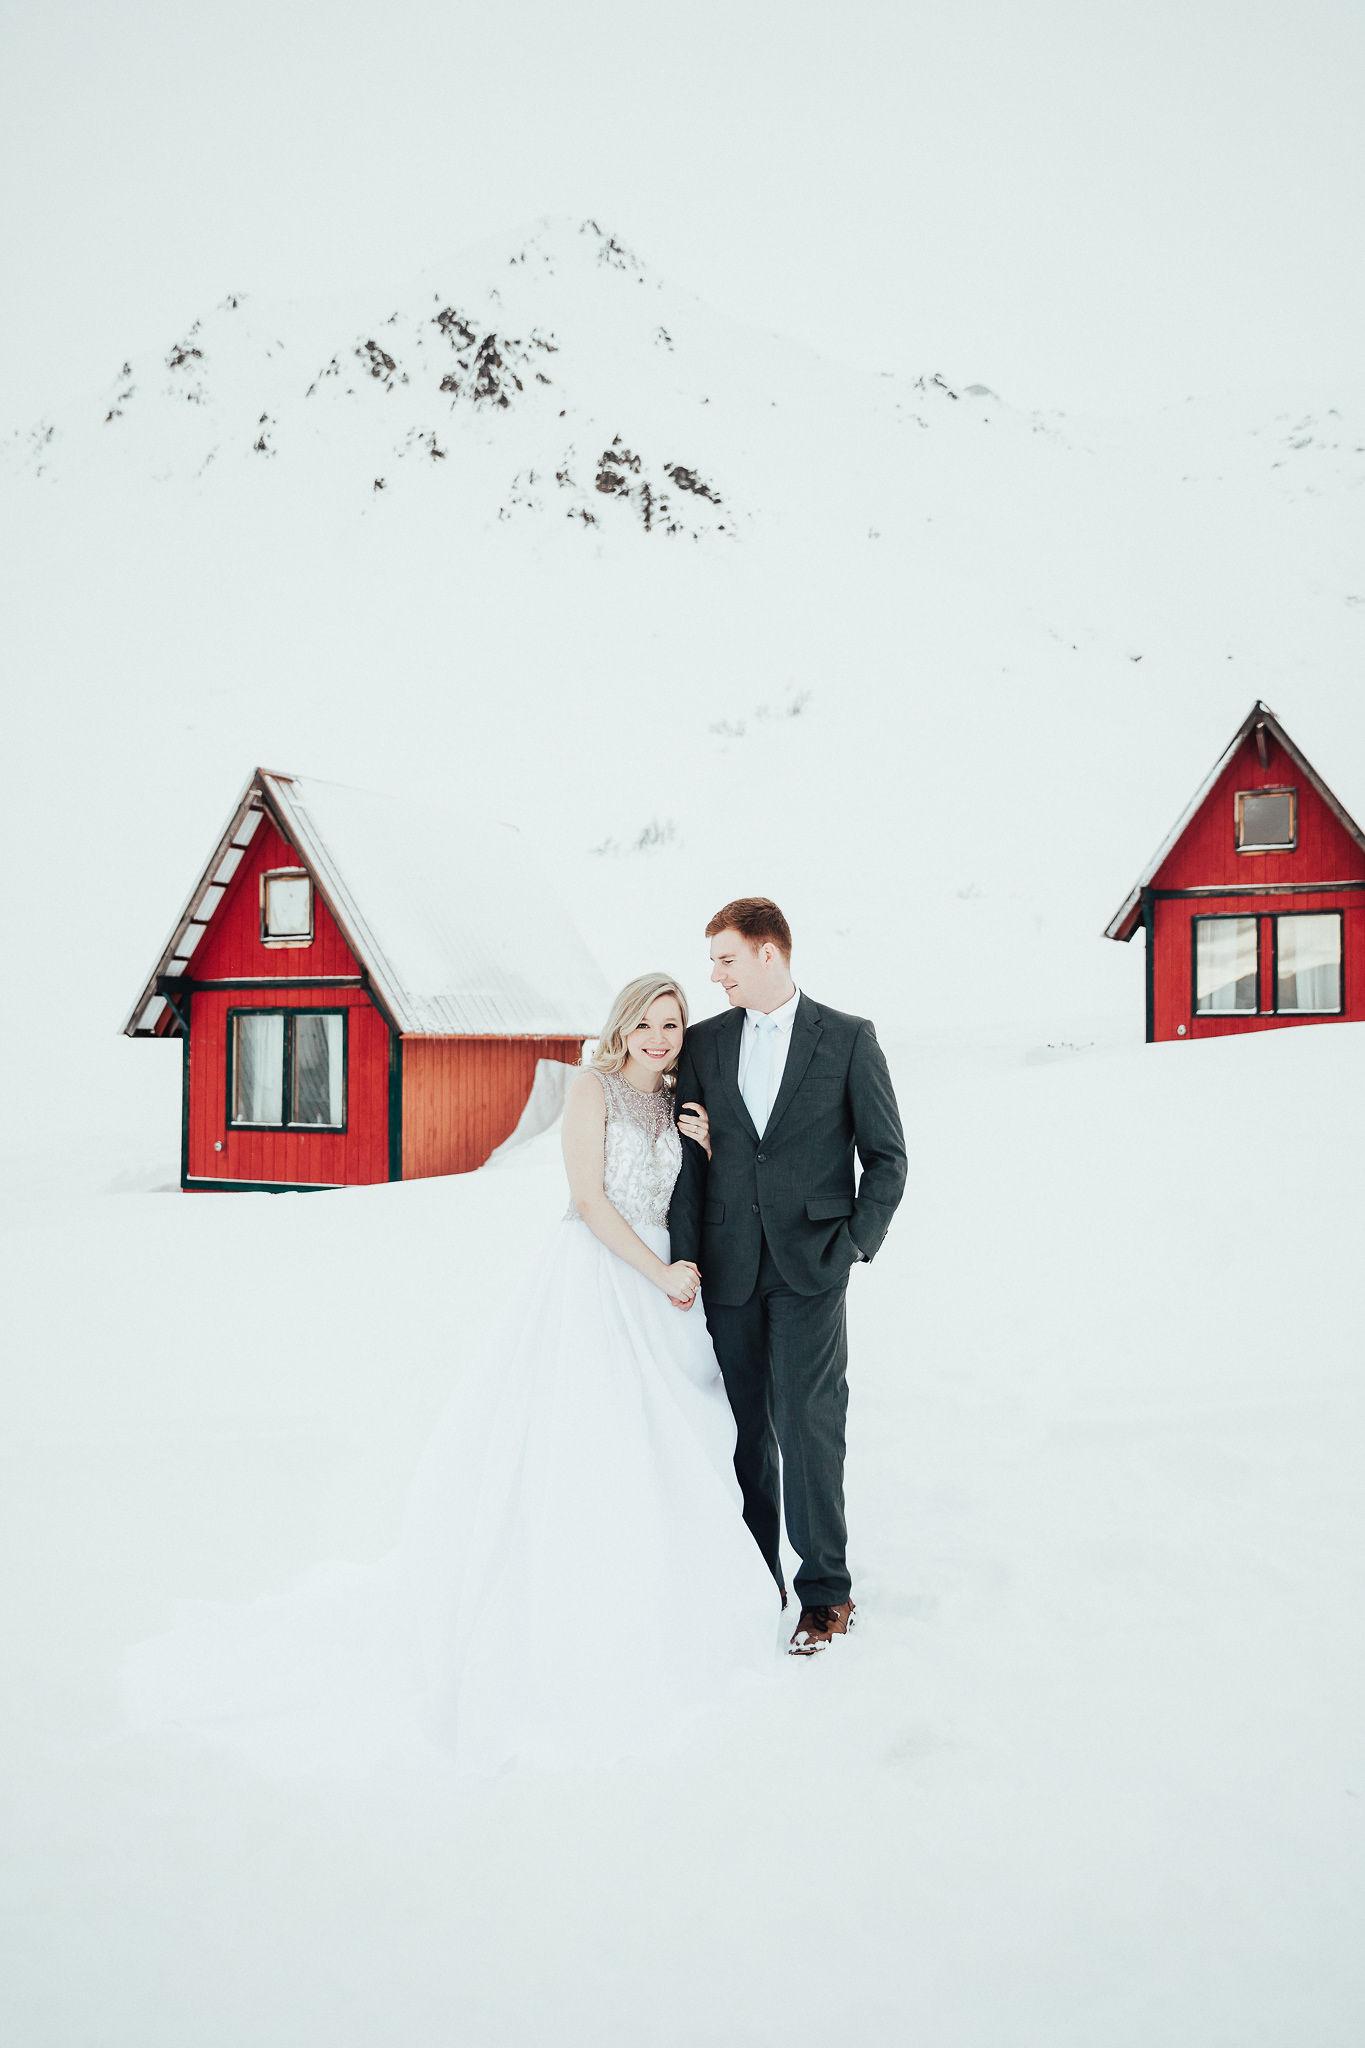 Anchorage, Alaska Winter Wedding Adventurous Wedding. Wandering Weddings